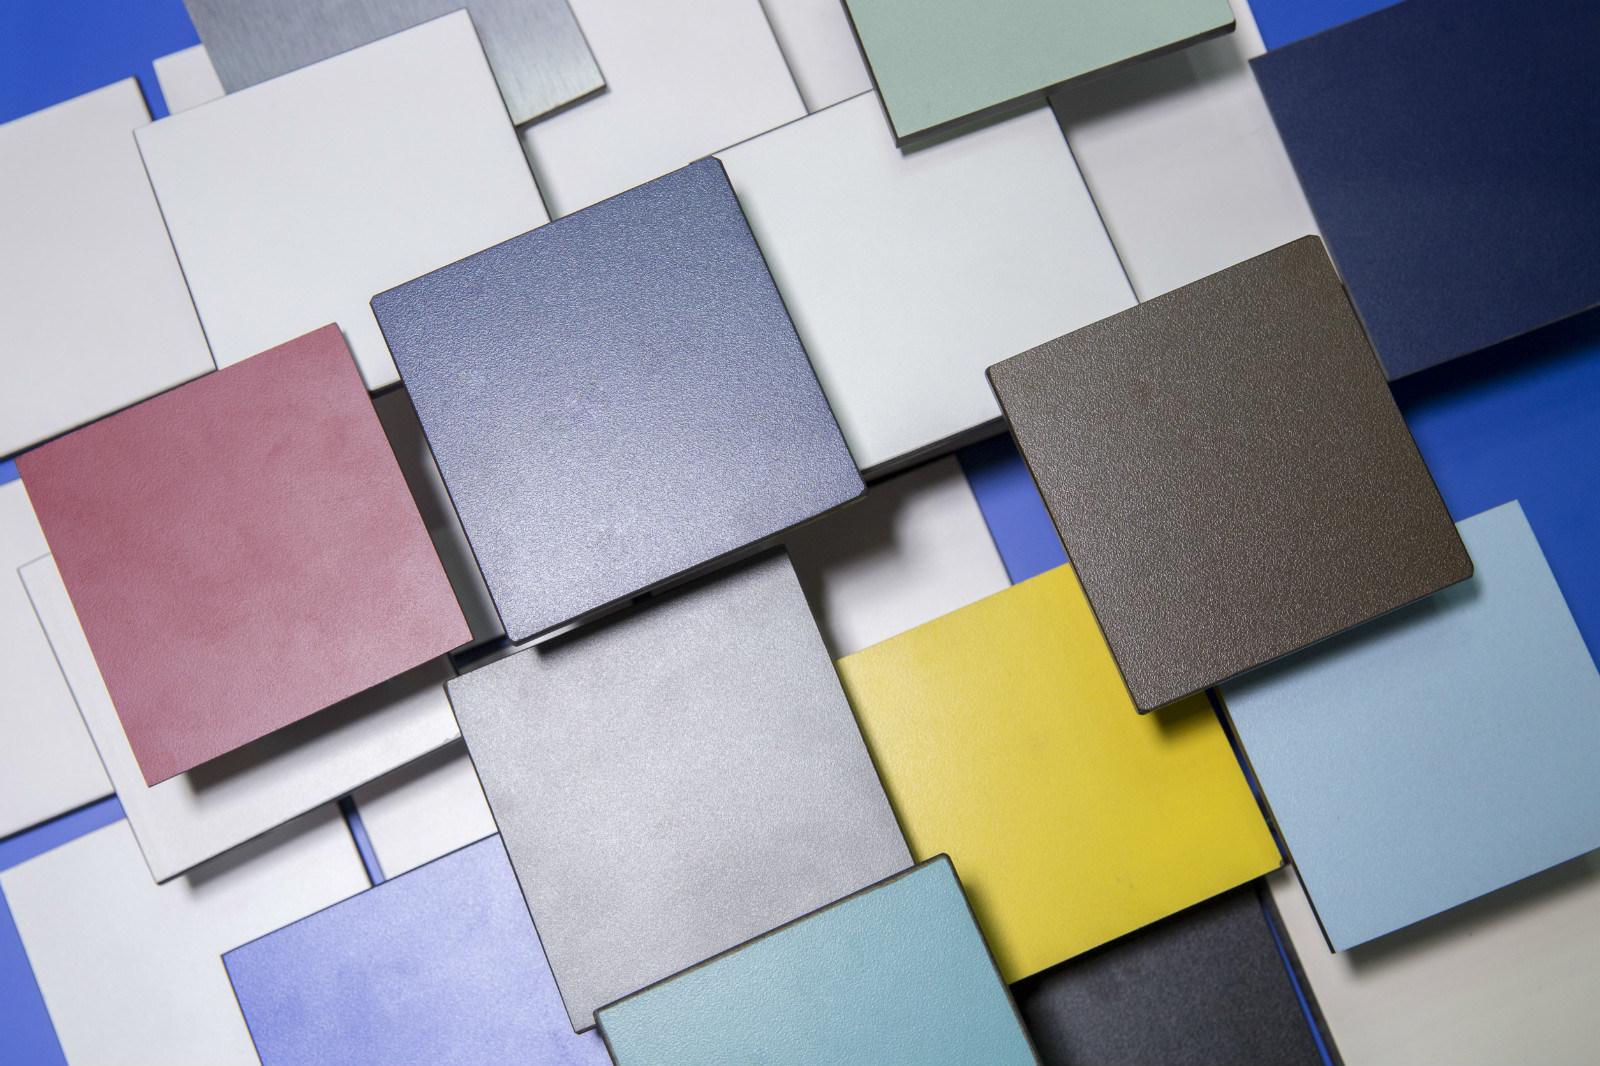 Sample of Compact Laminate Board/Sheet (HPL)